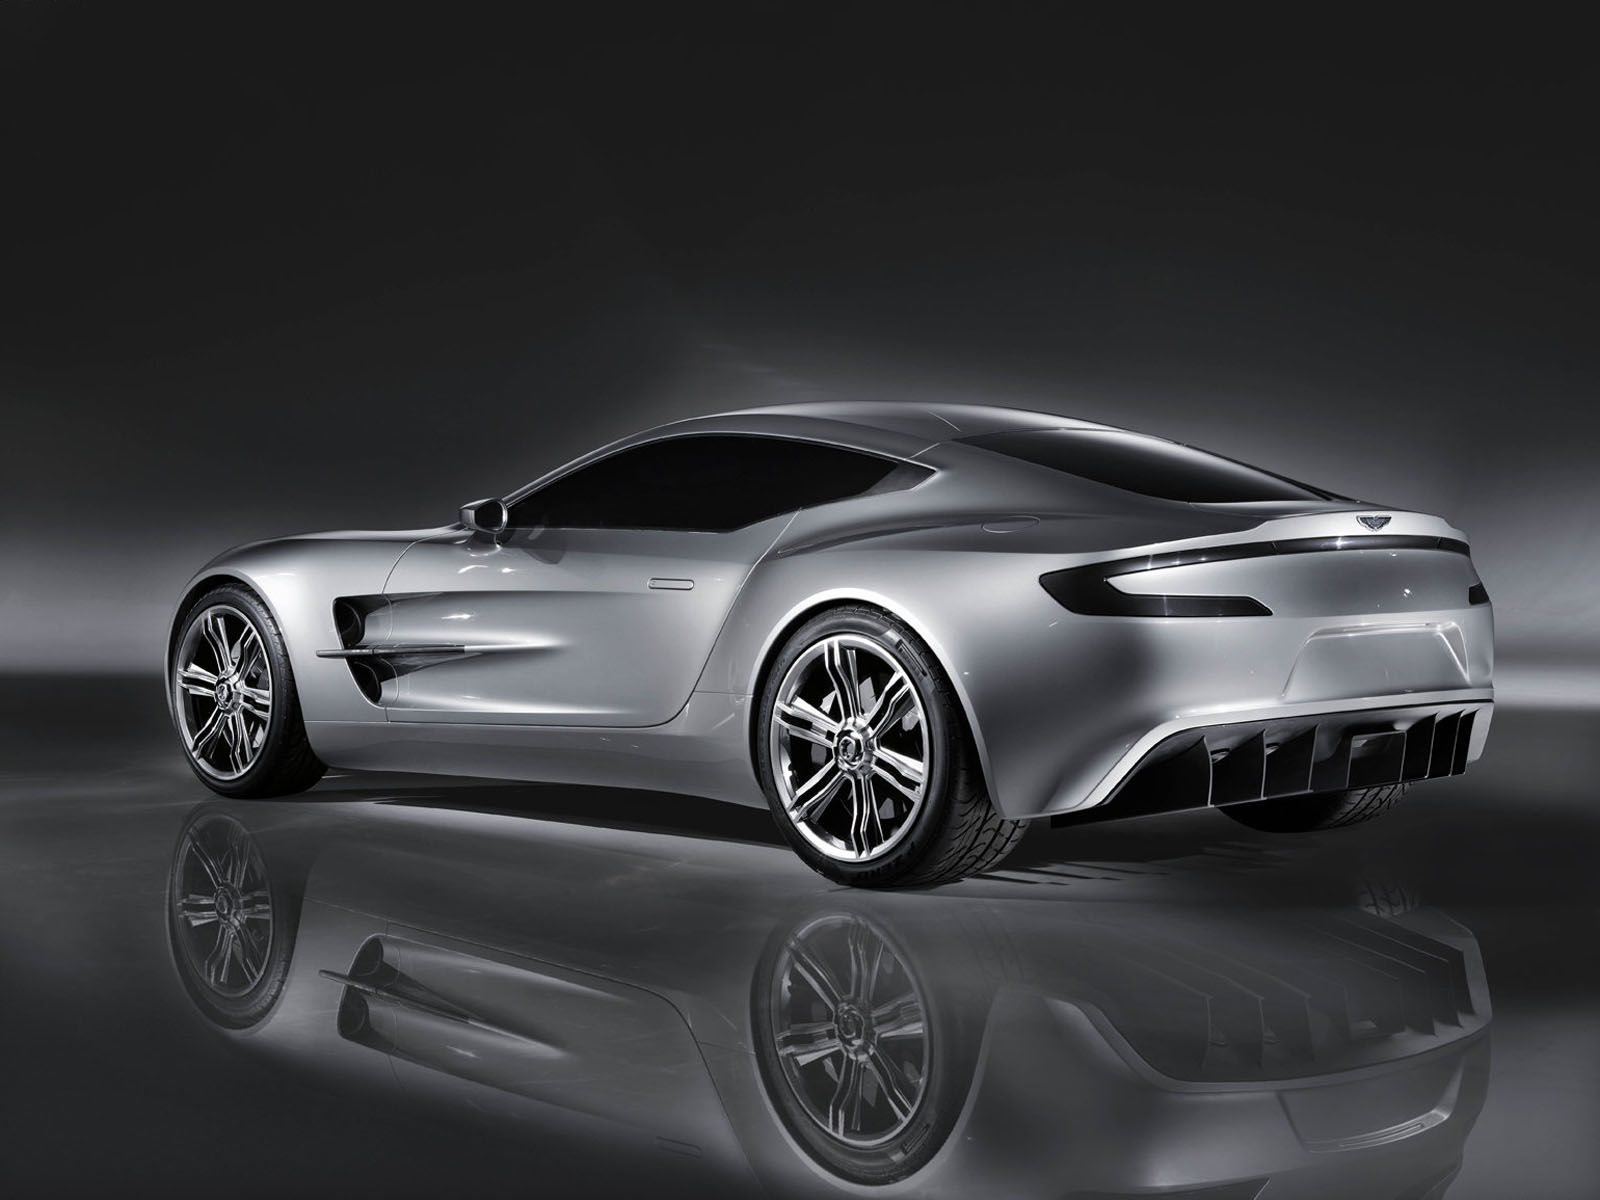 Aston Martin HD Wallpapers – wallpaper202